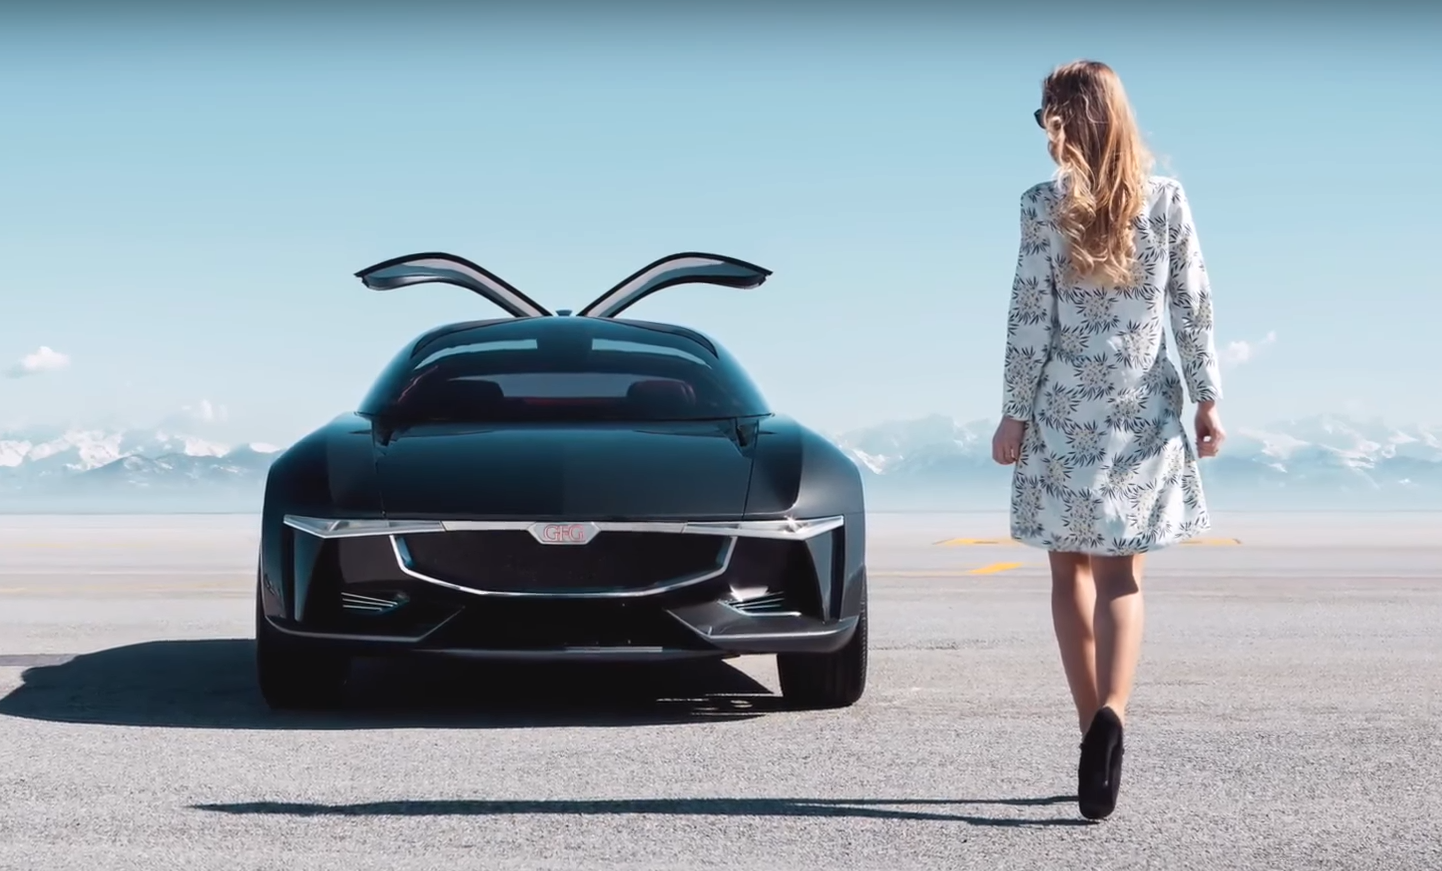 designerul-legendar-giugiaro-a-dezvaluit-un-secret-pastrat-56-de-ani-video